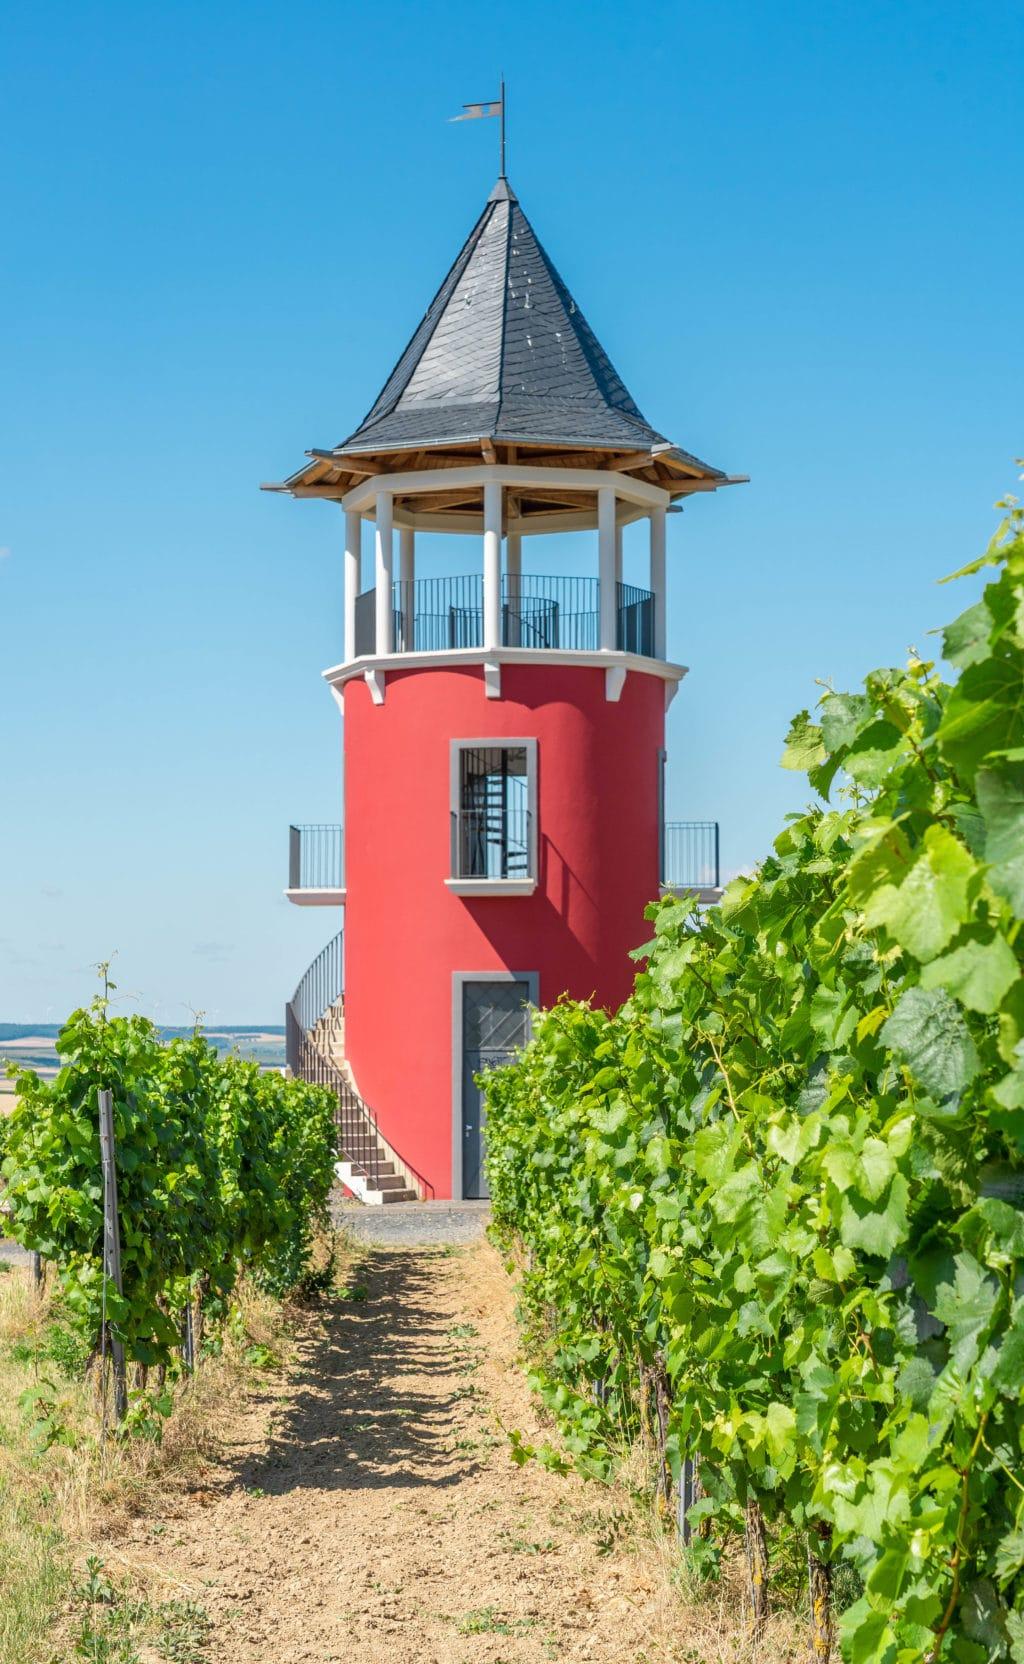 burgunderturm-woerrstadt